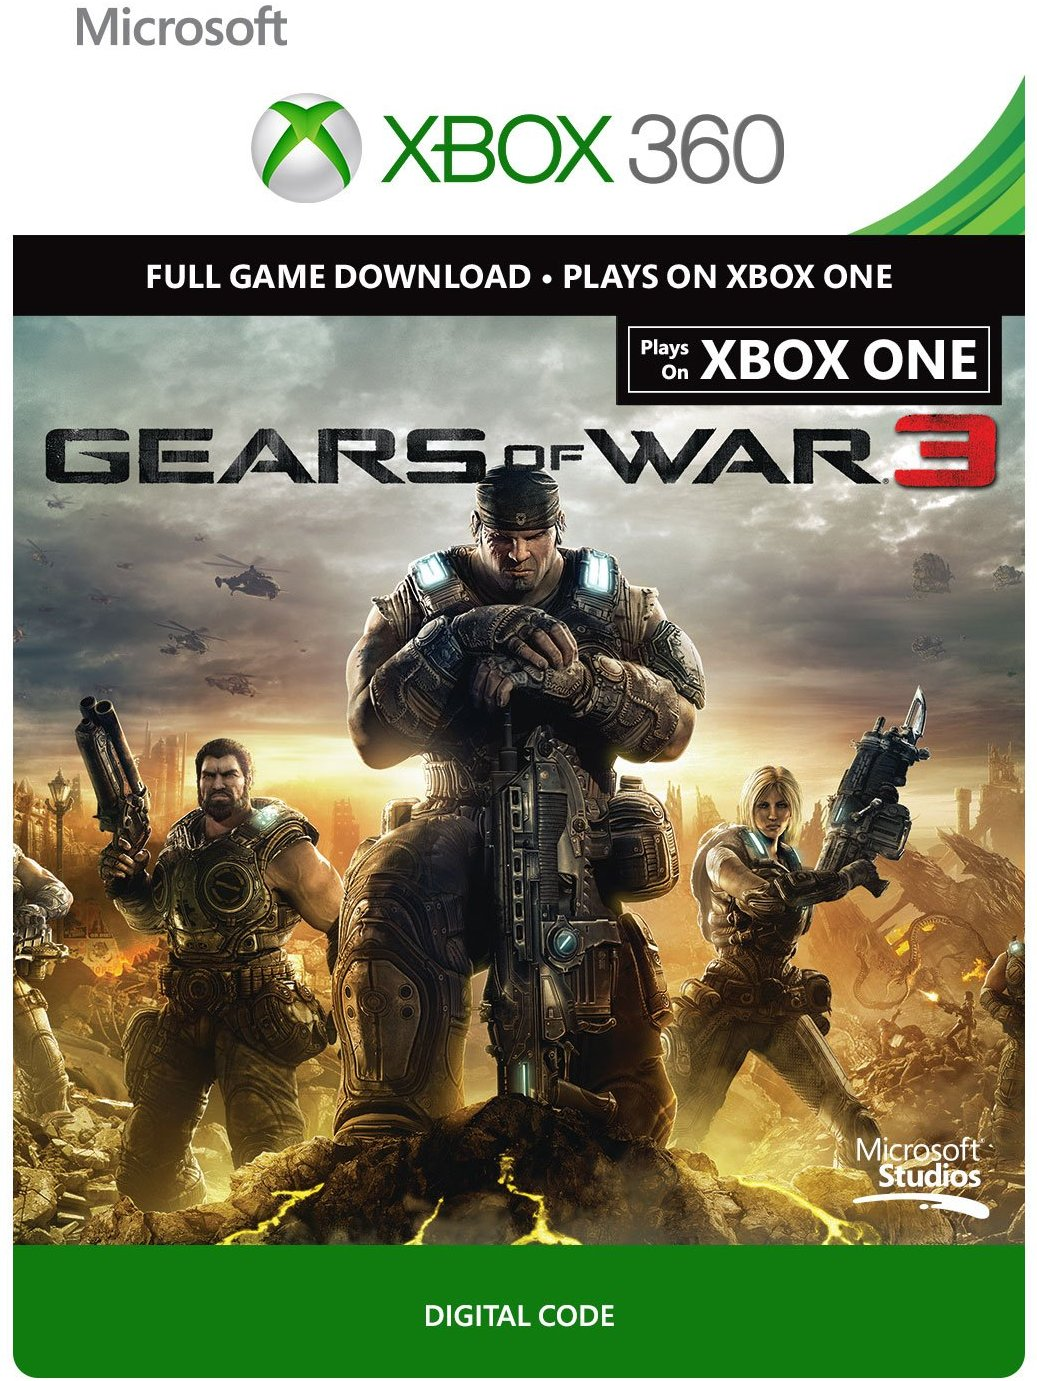 Gears of war pc cd key 100% working youtube.